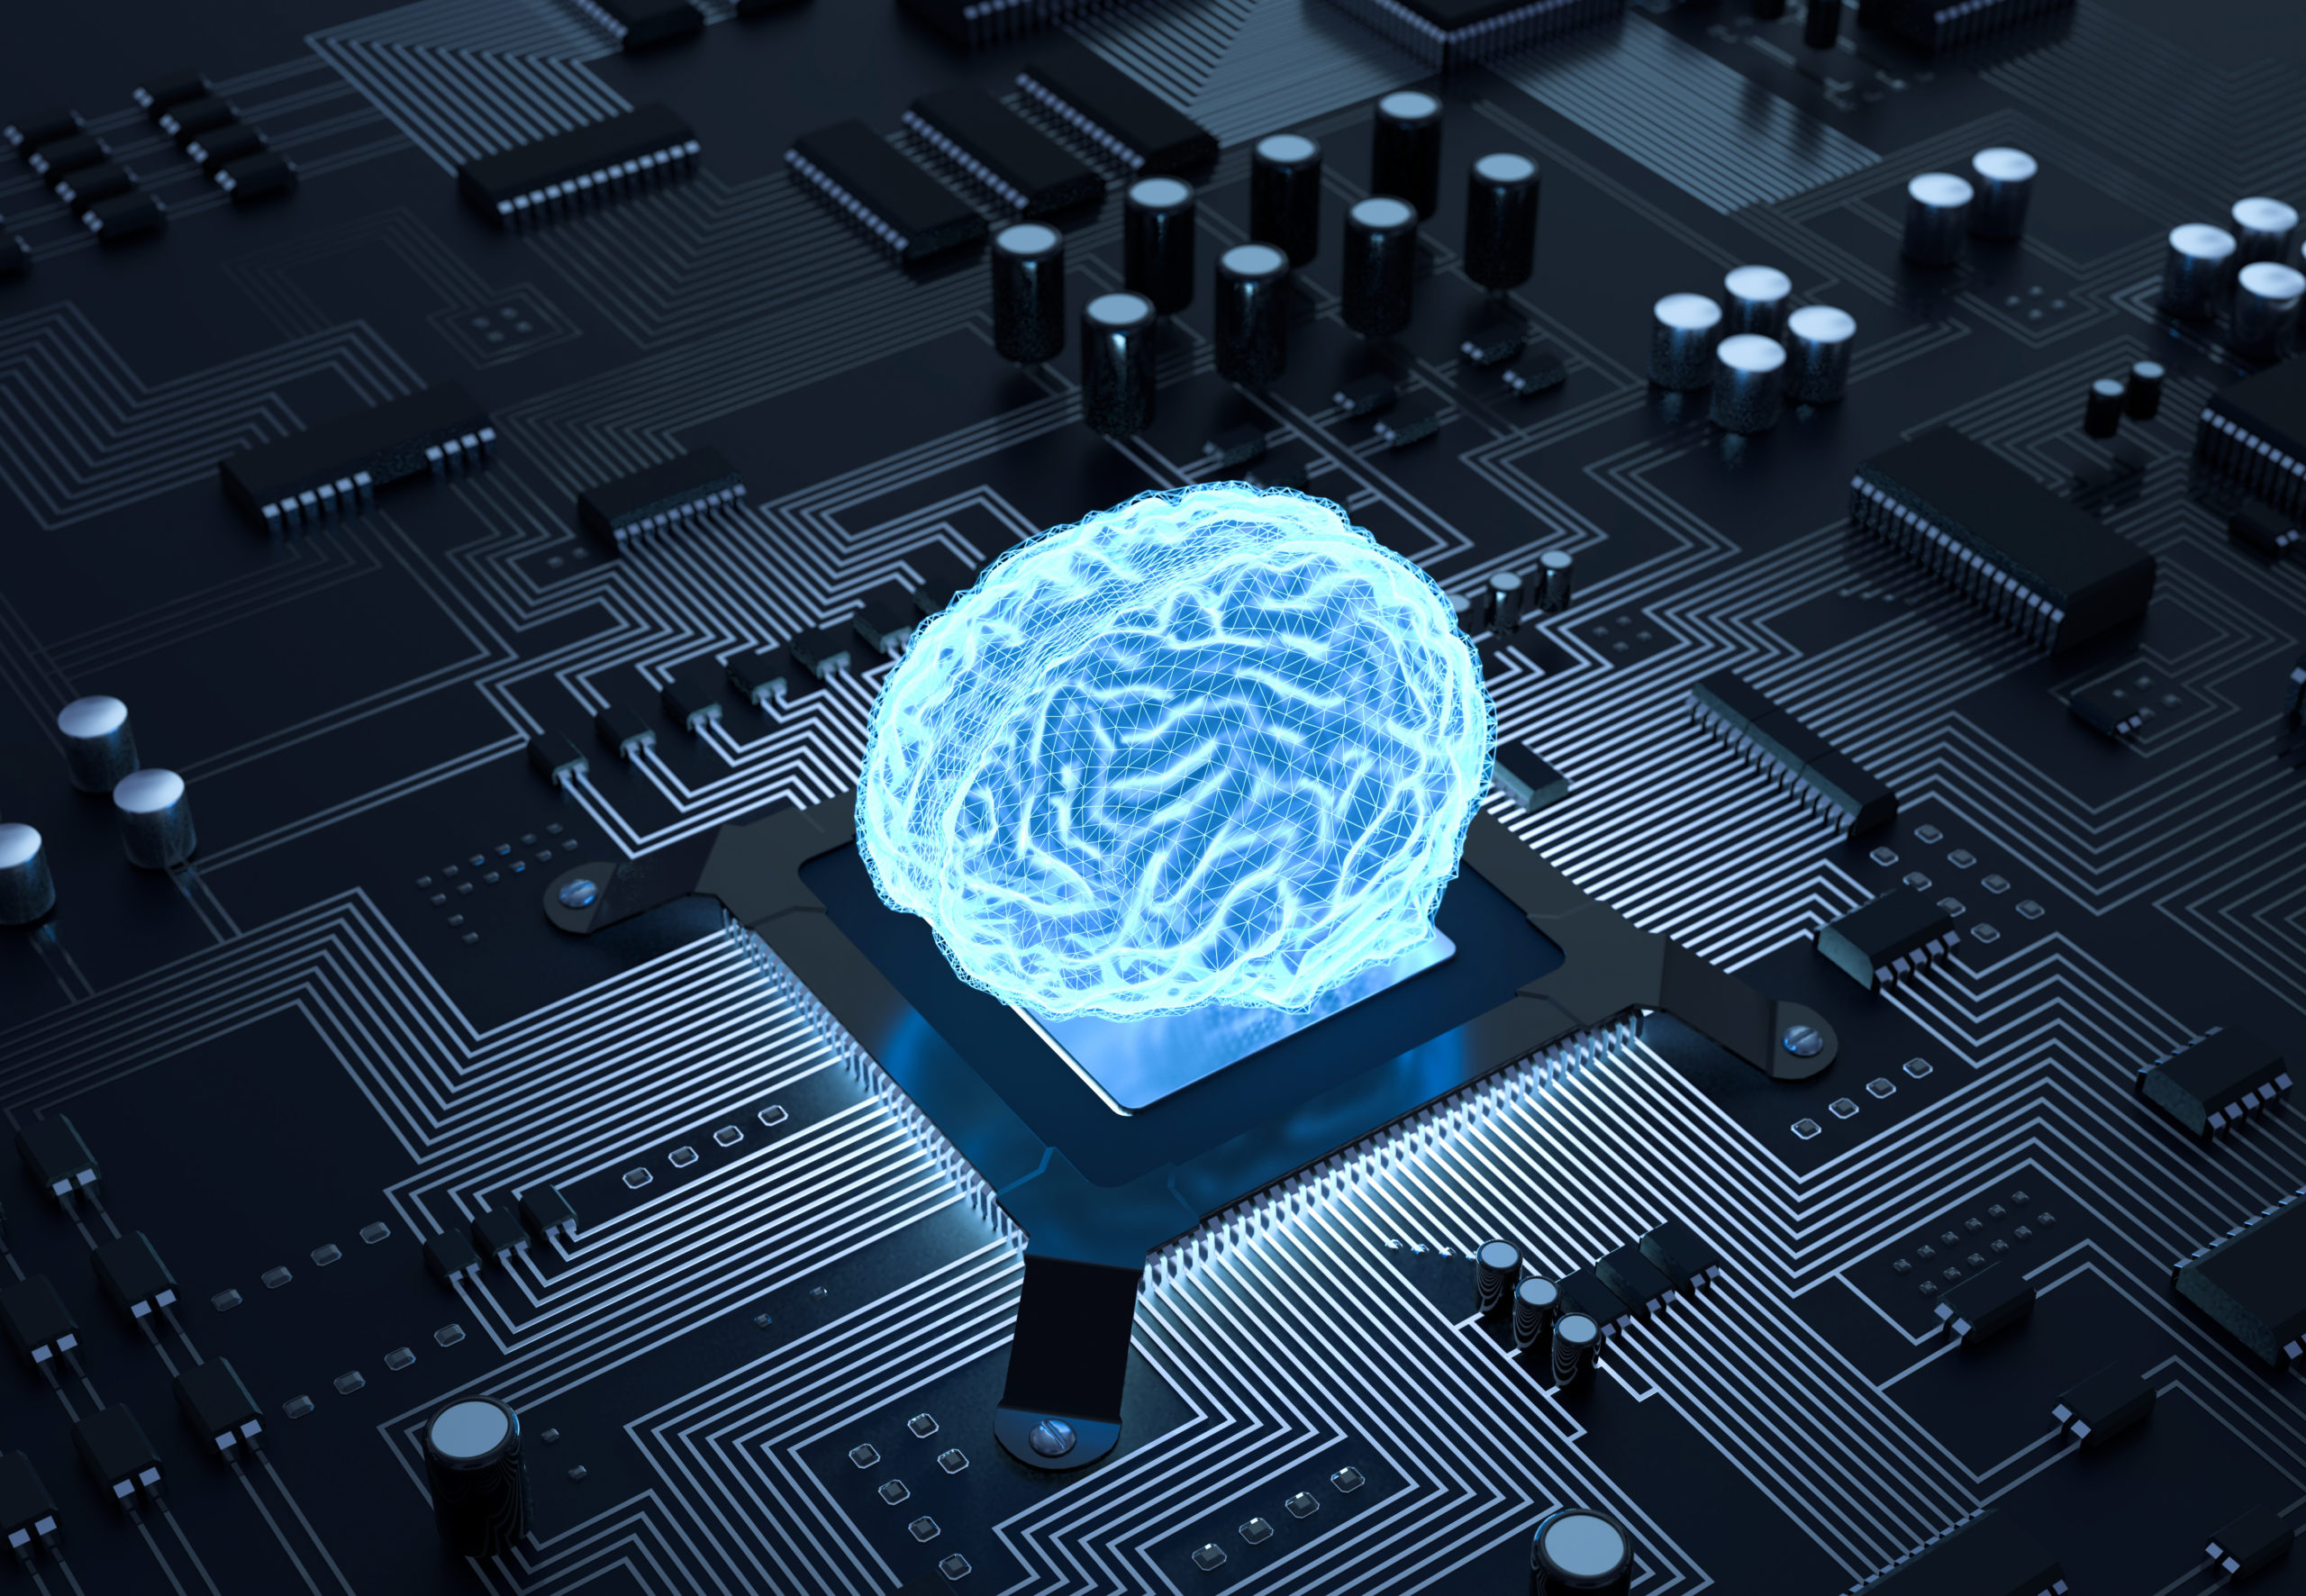 Integrated optical neurocomputing